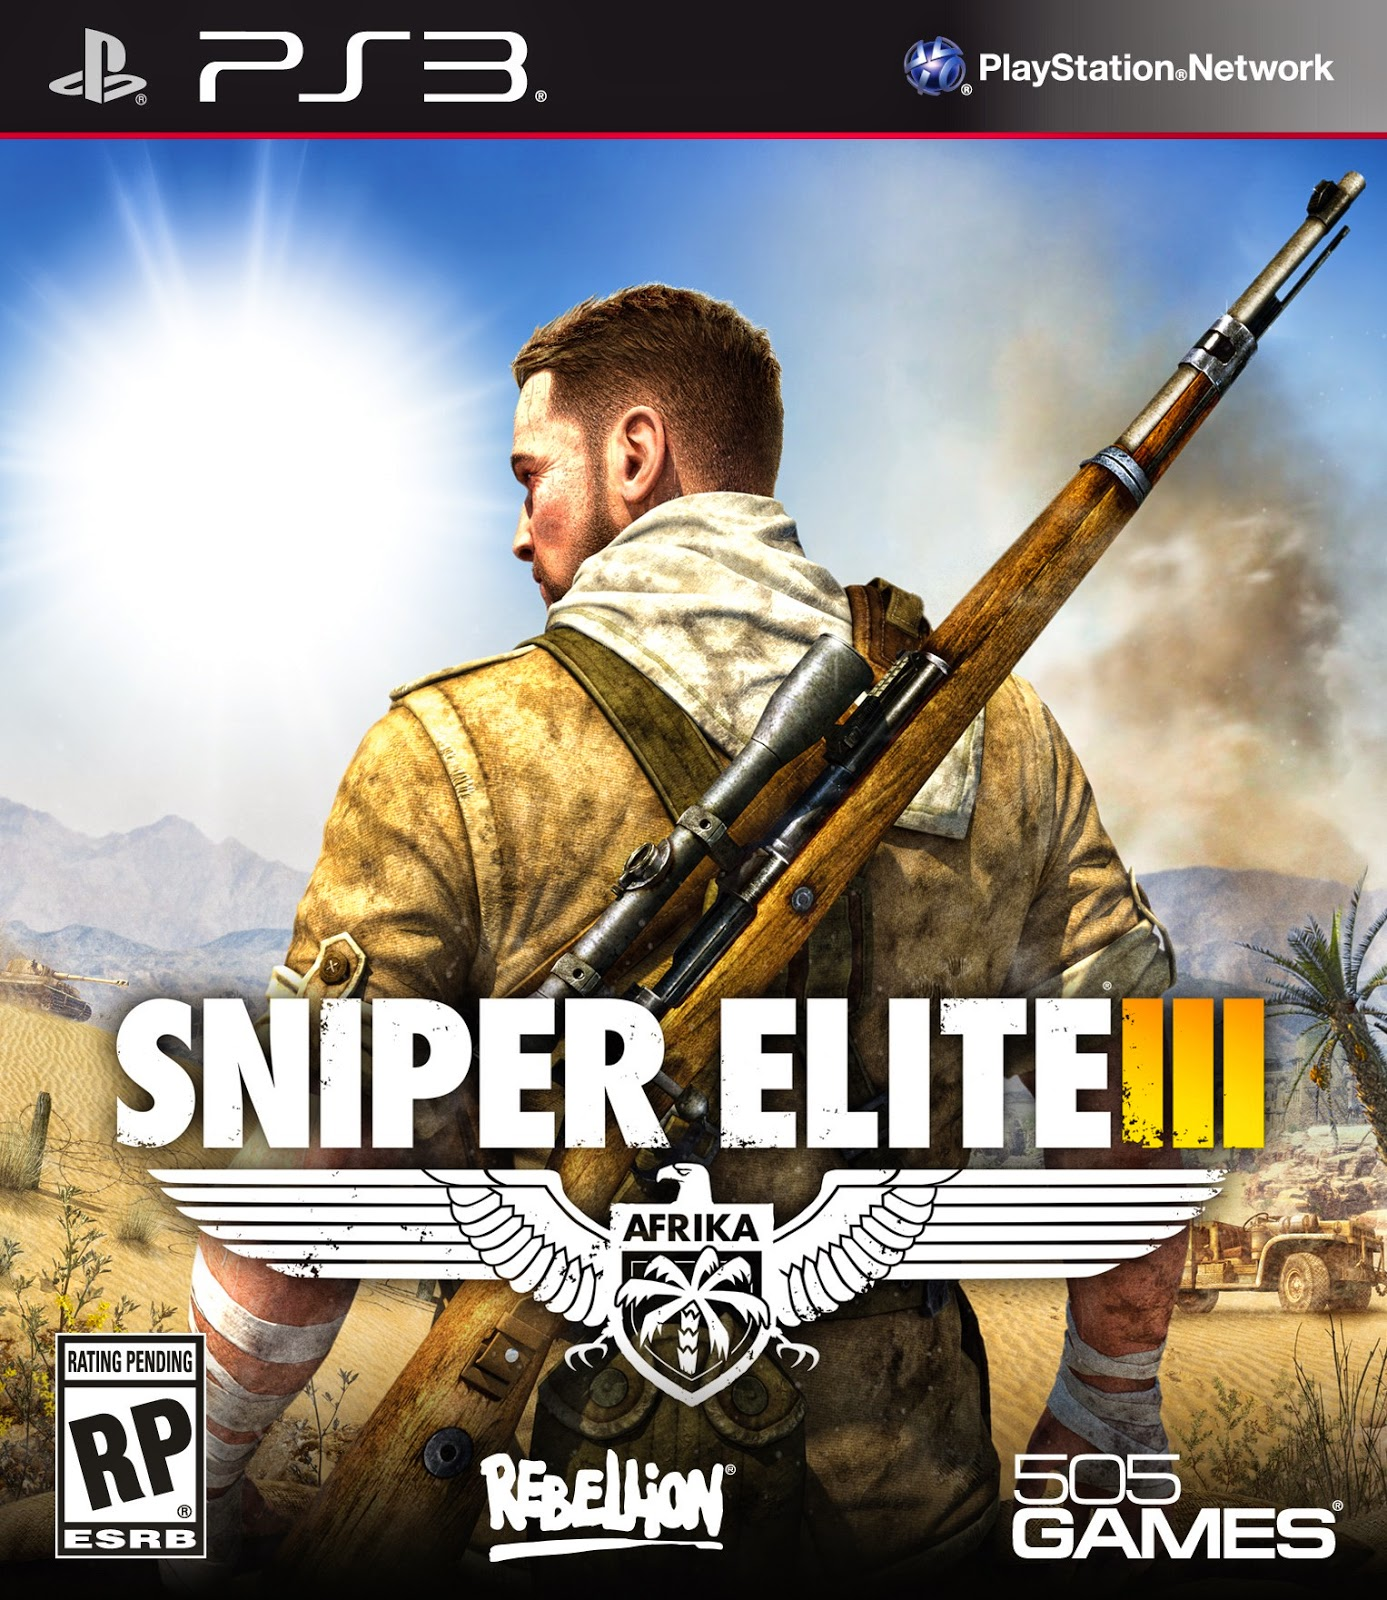 Download Game Sniper Elite 3 For PC